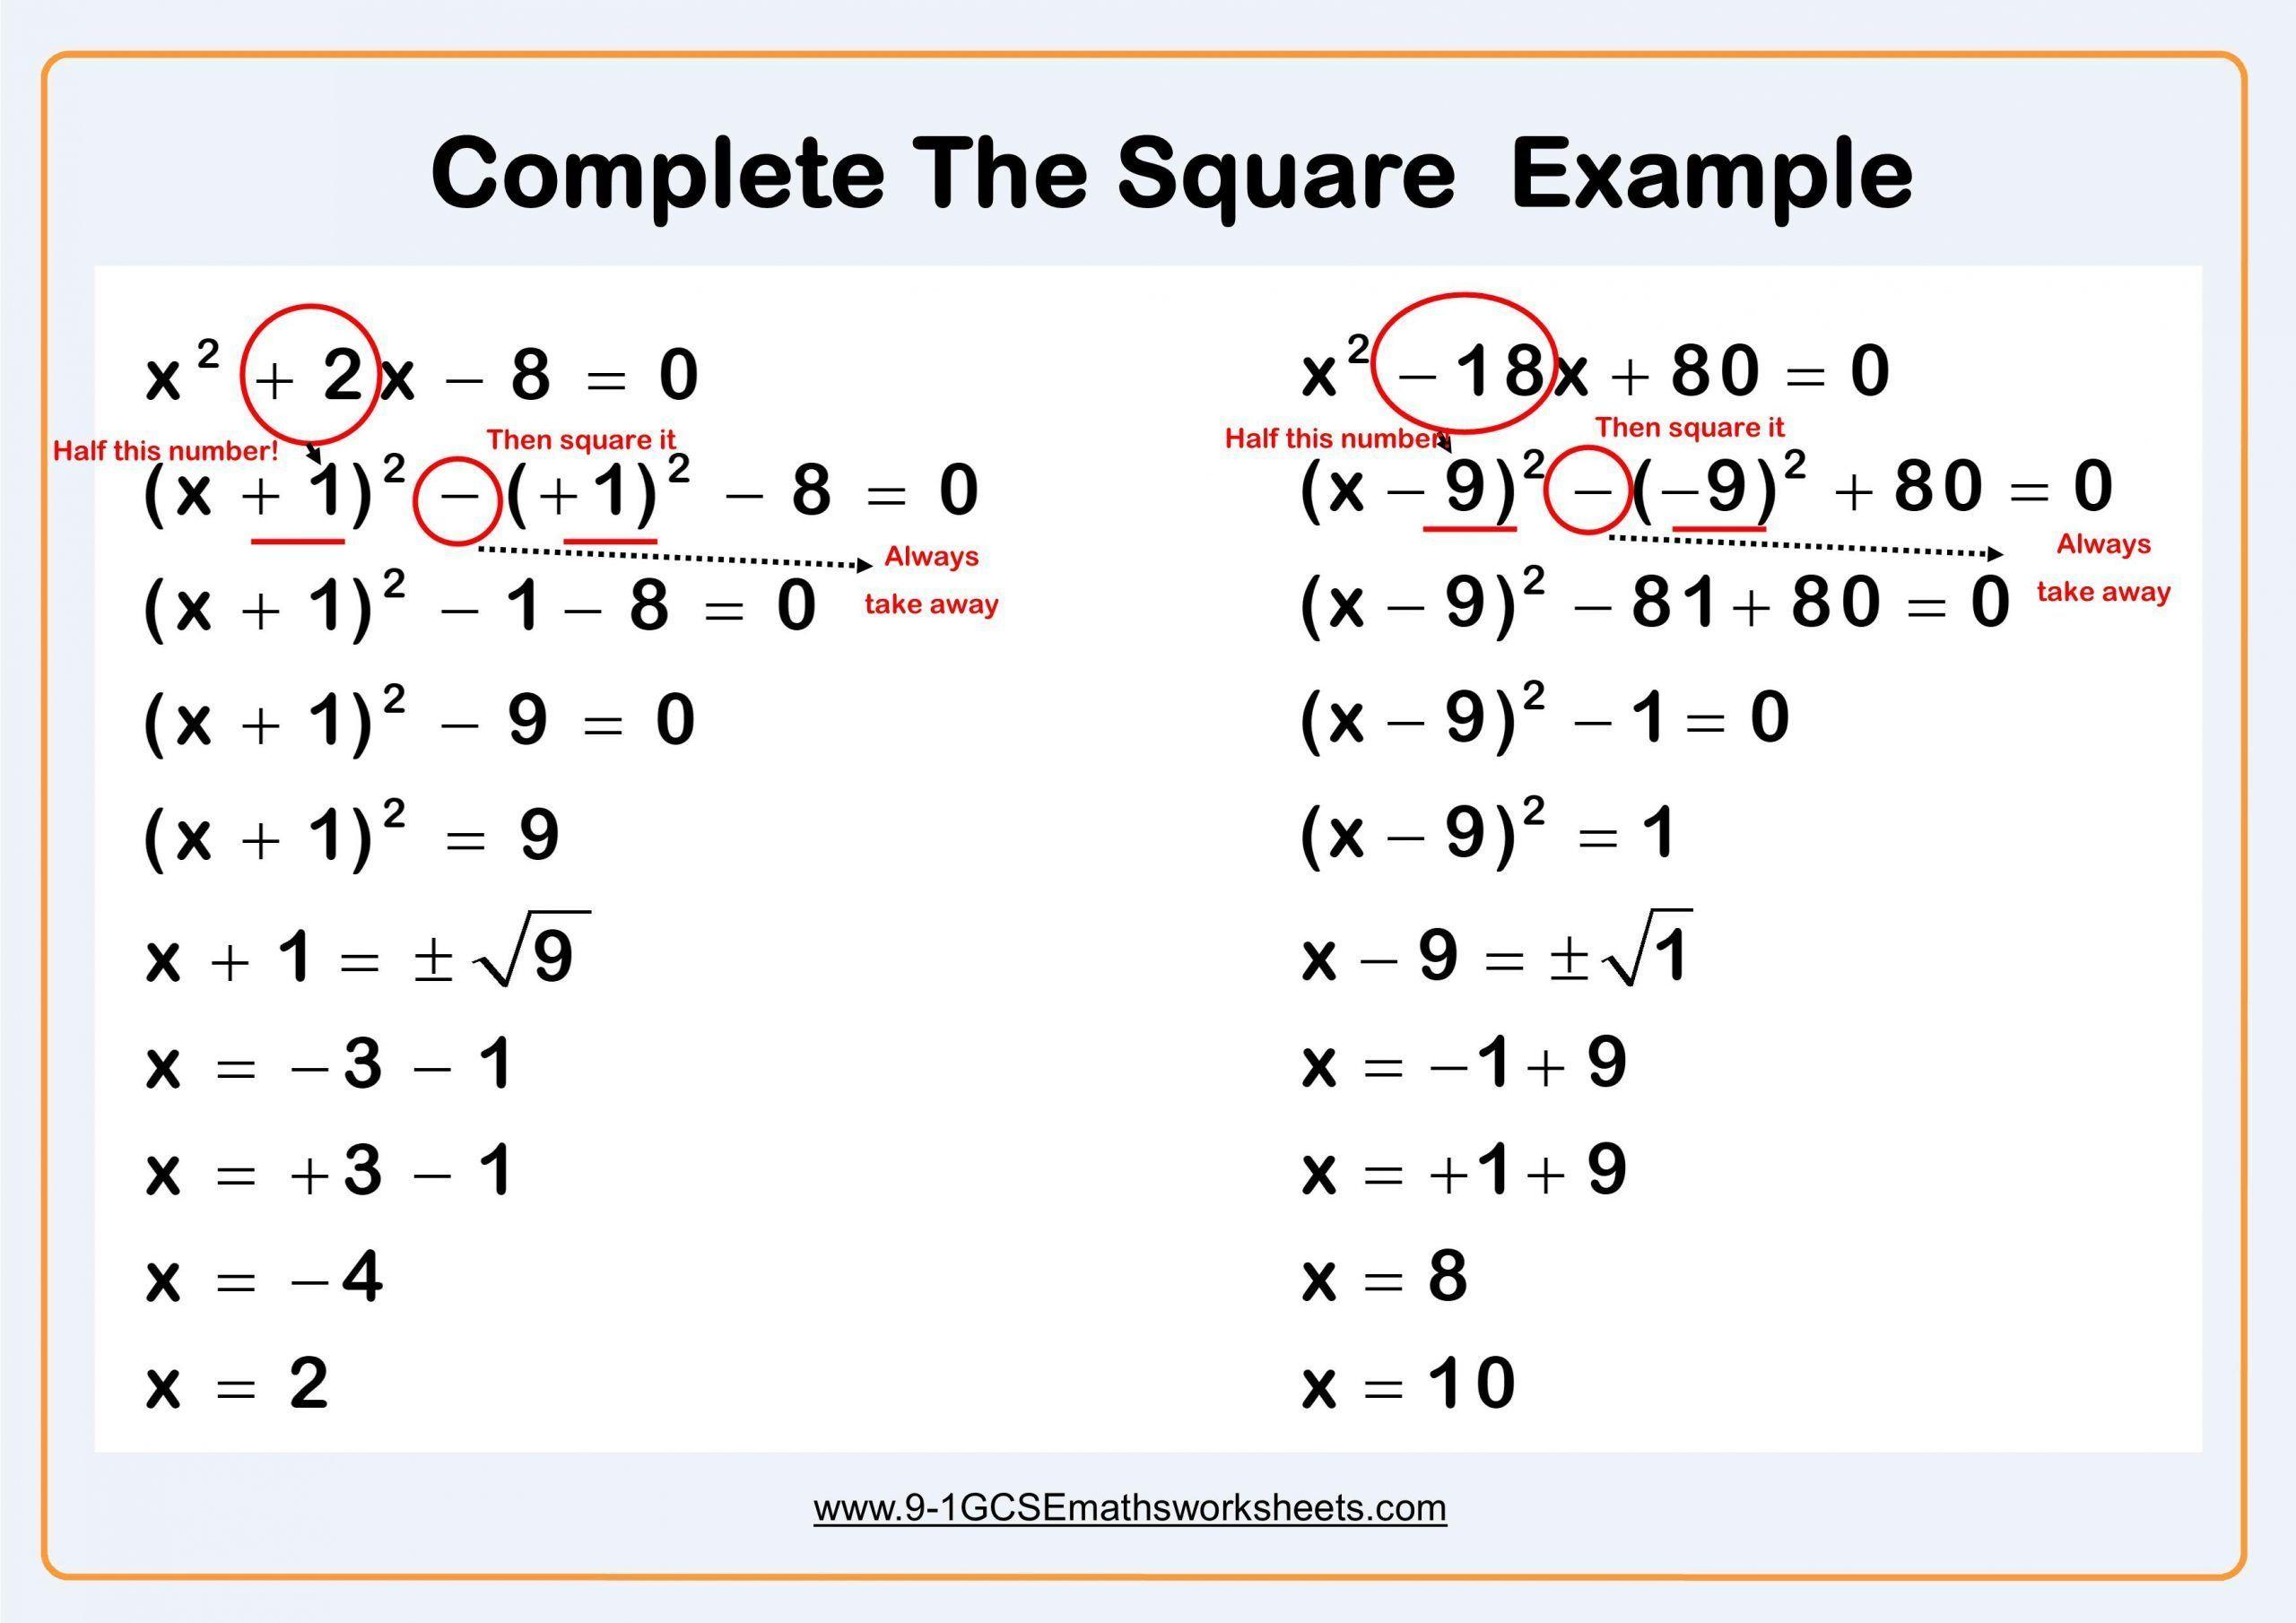 8 4 2 Practice Solving Quadratic Equations By Graphing Worksheet Answers Solving Quadratic Equations Completing The Square Quadratics [ 1810 x 2560 Pixel ]